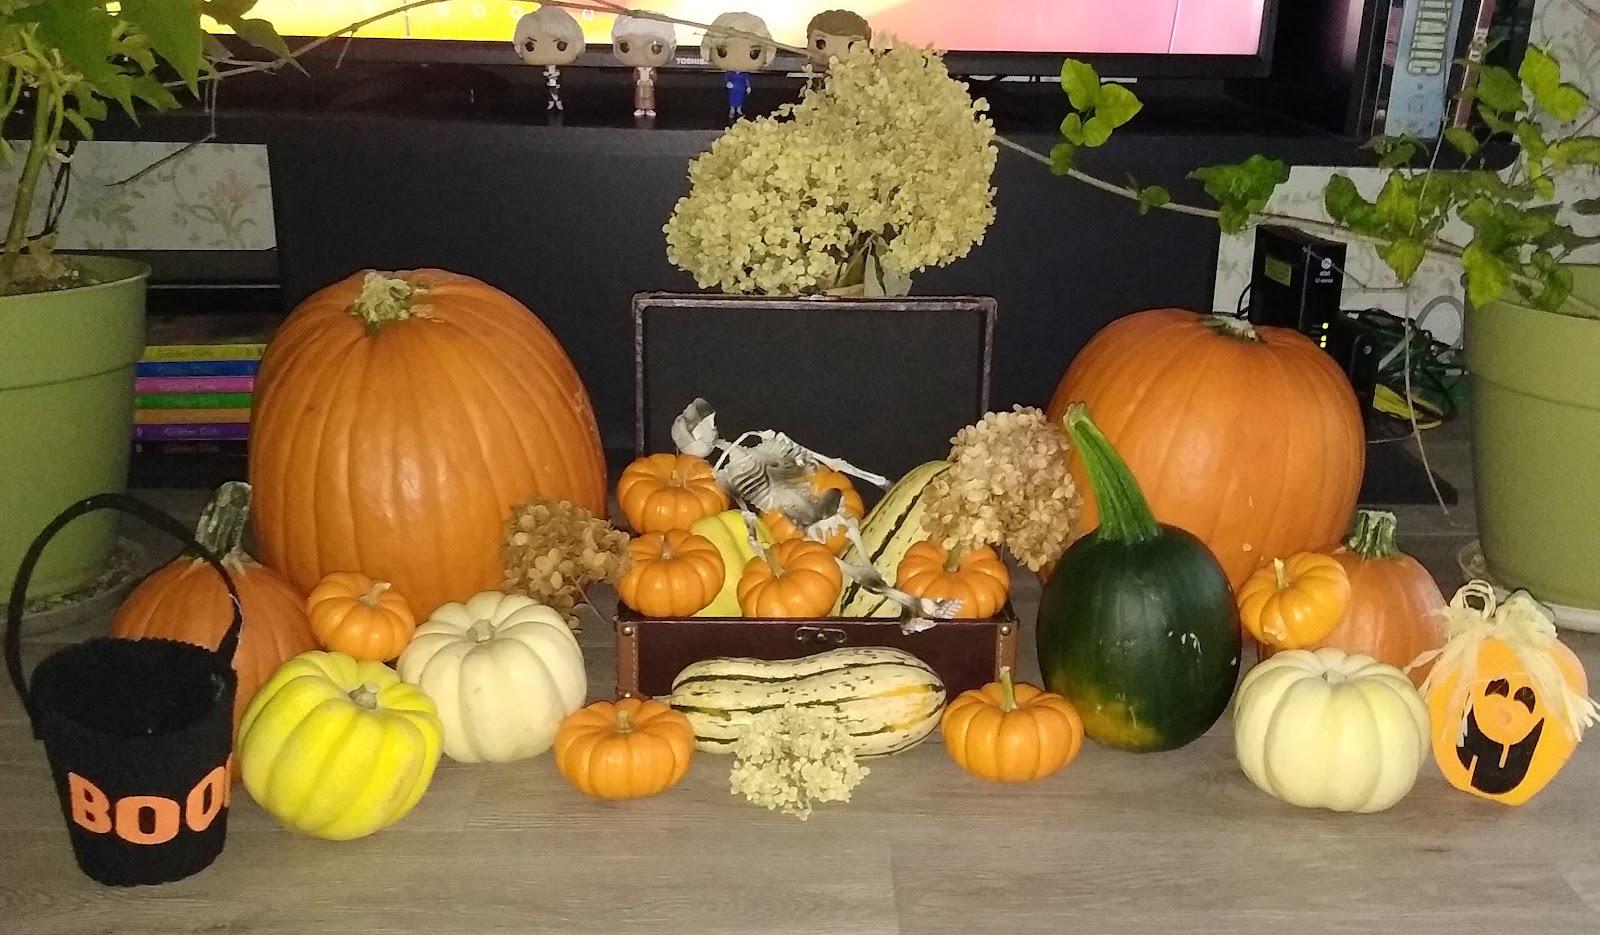 Halloween pumpkin decorations picture